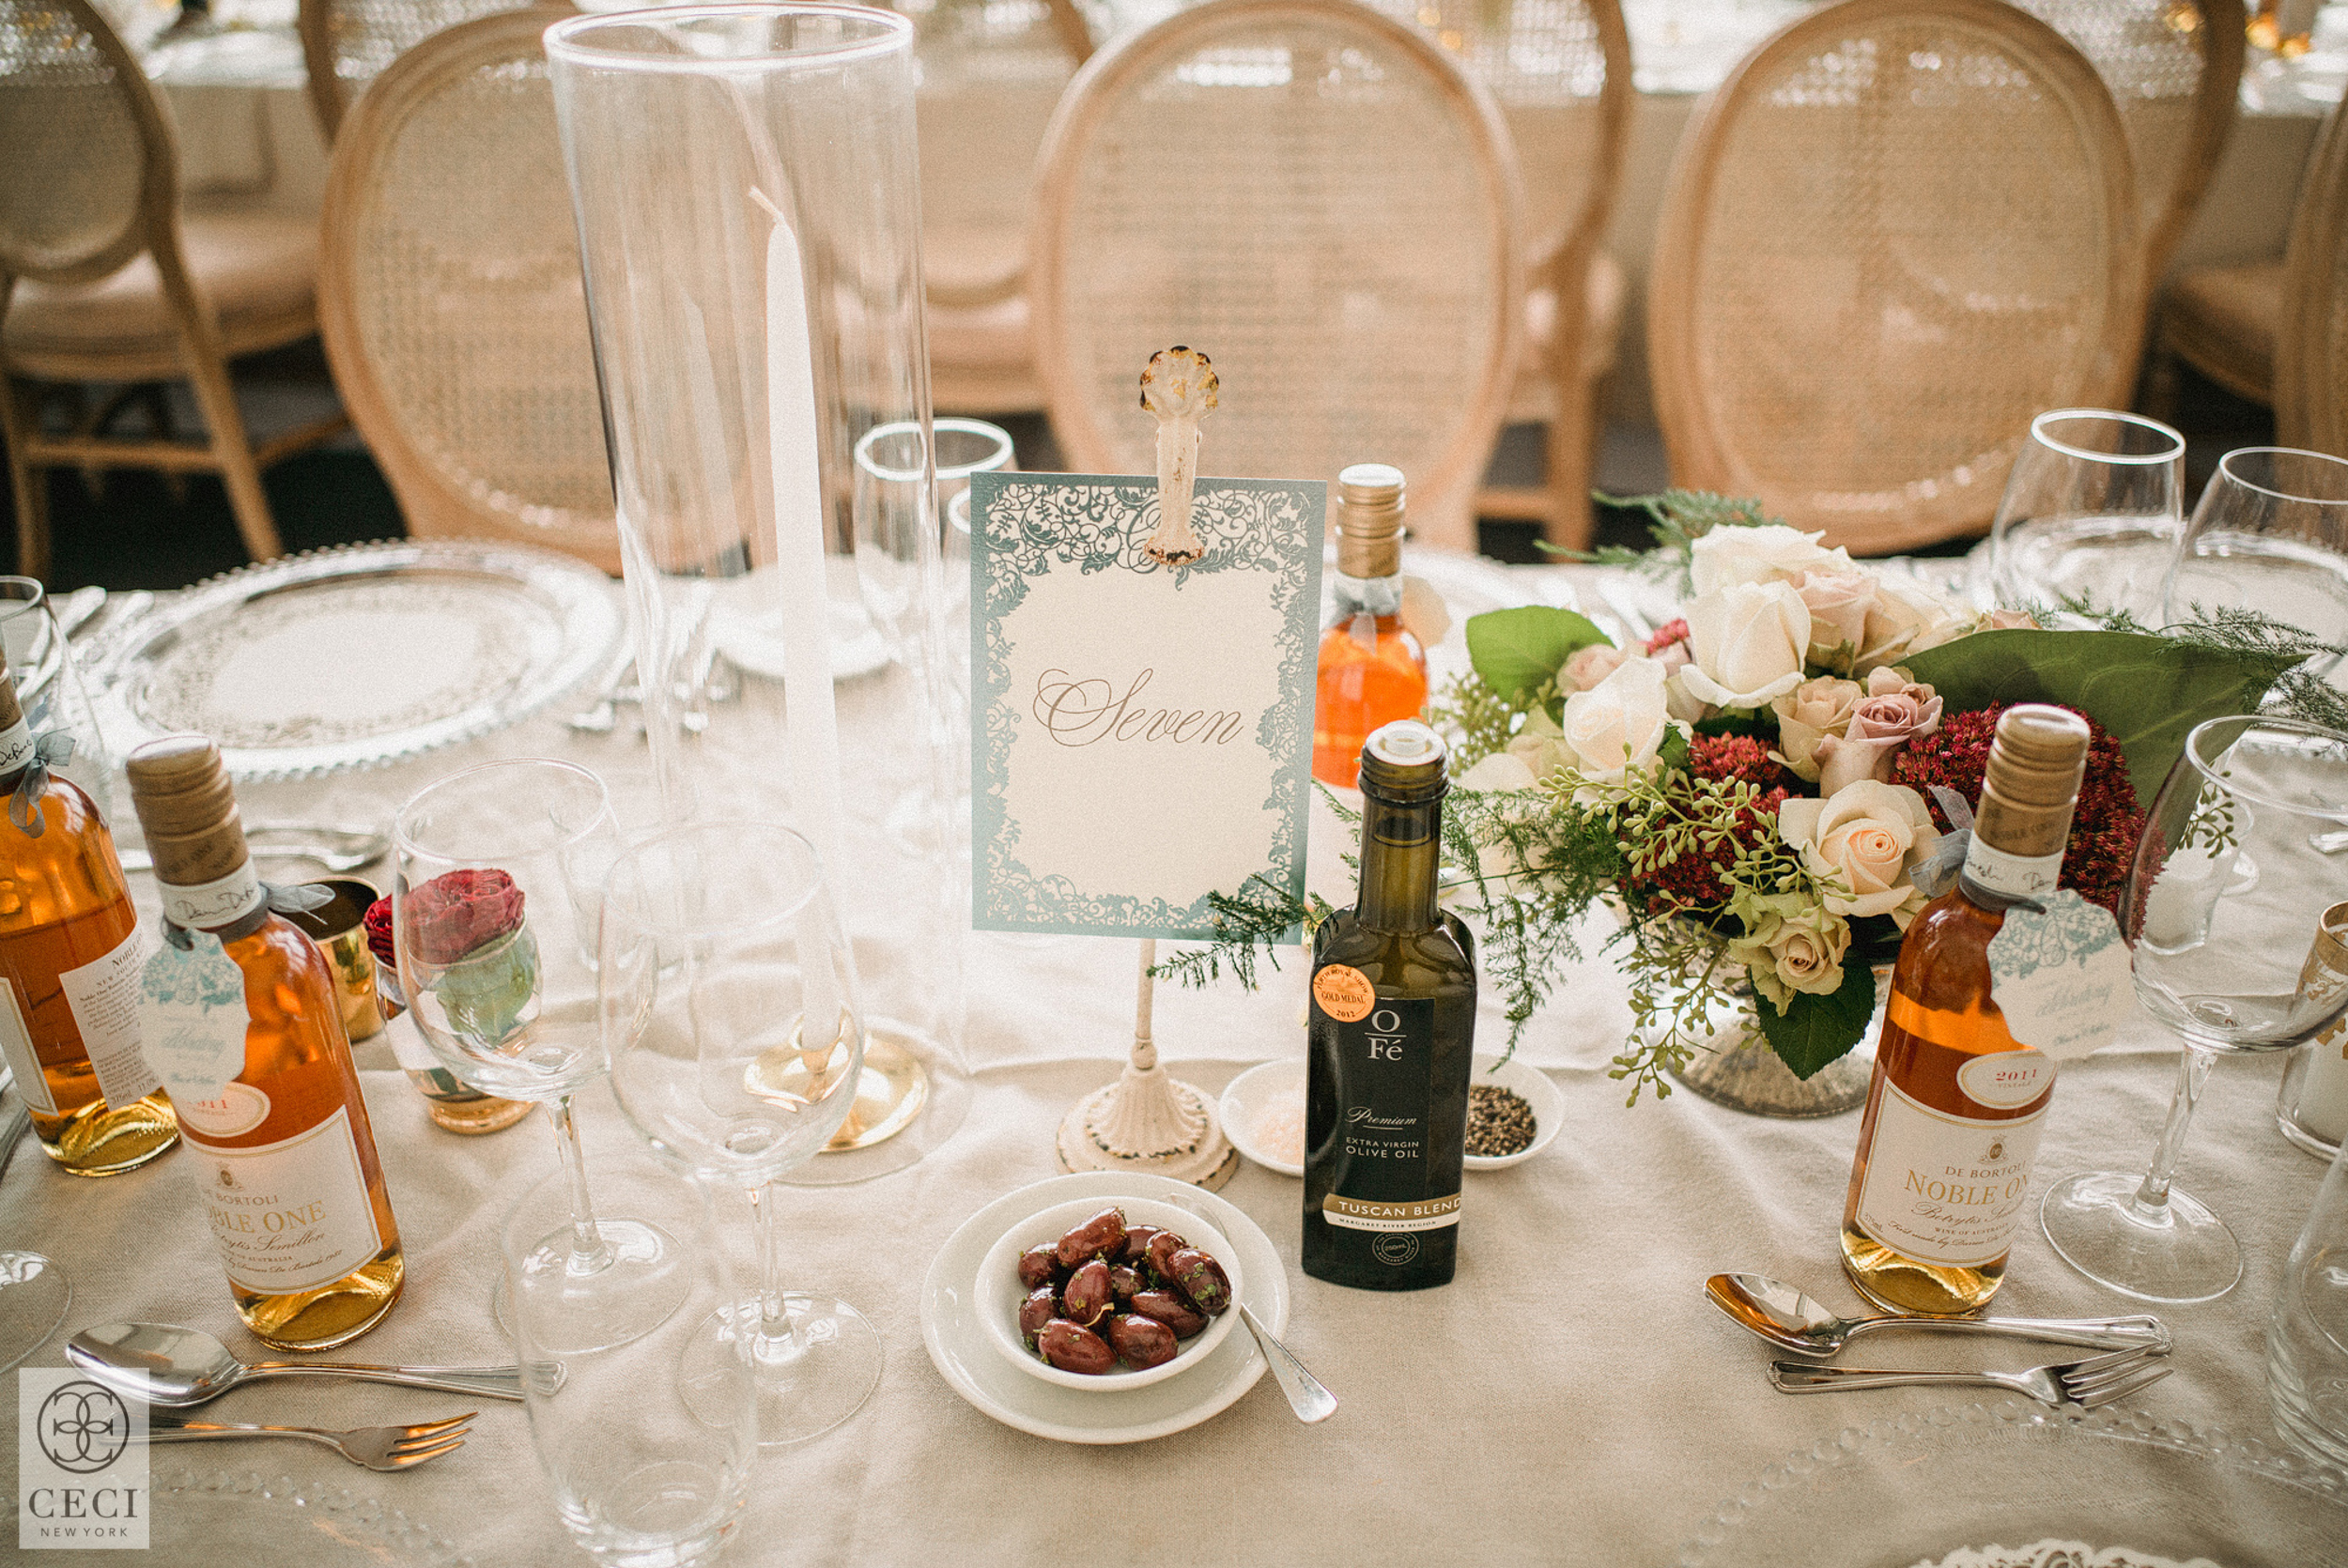 Ceci_New_York_Custom_Luxury_Wedding_BeautyShot_LaserCut_Stationery_Personalized_Couture_Foil_Stamping_Perth_Destination_Australia_Chic_-16.jpg